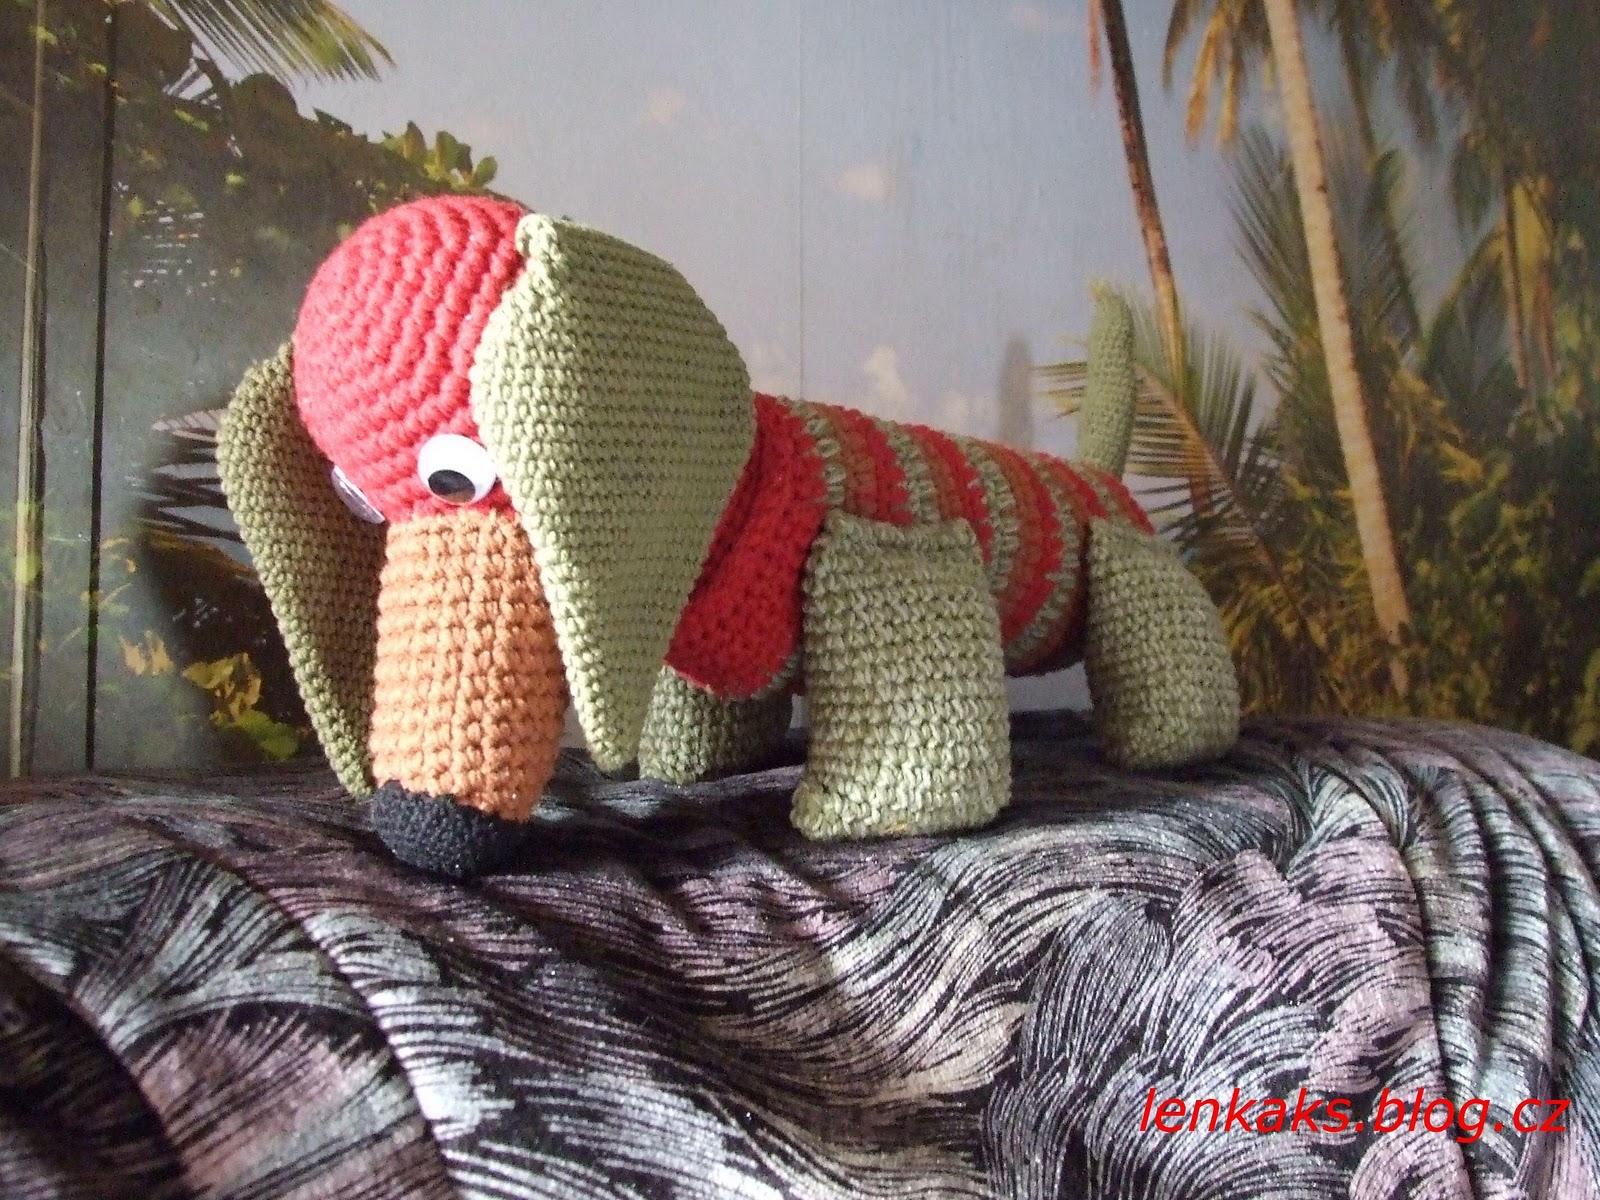 Free Crochet Pattern Wiener Dog : 2000 Free Amigurumi Patterns: Dachshund crochet pattern